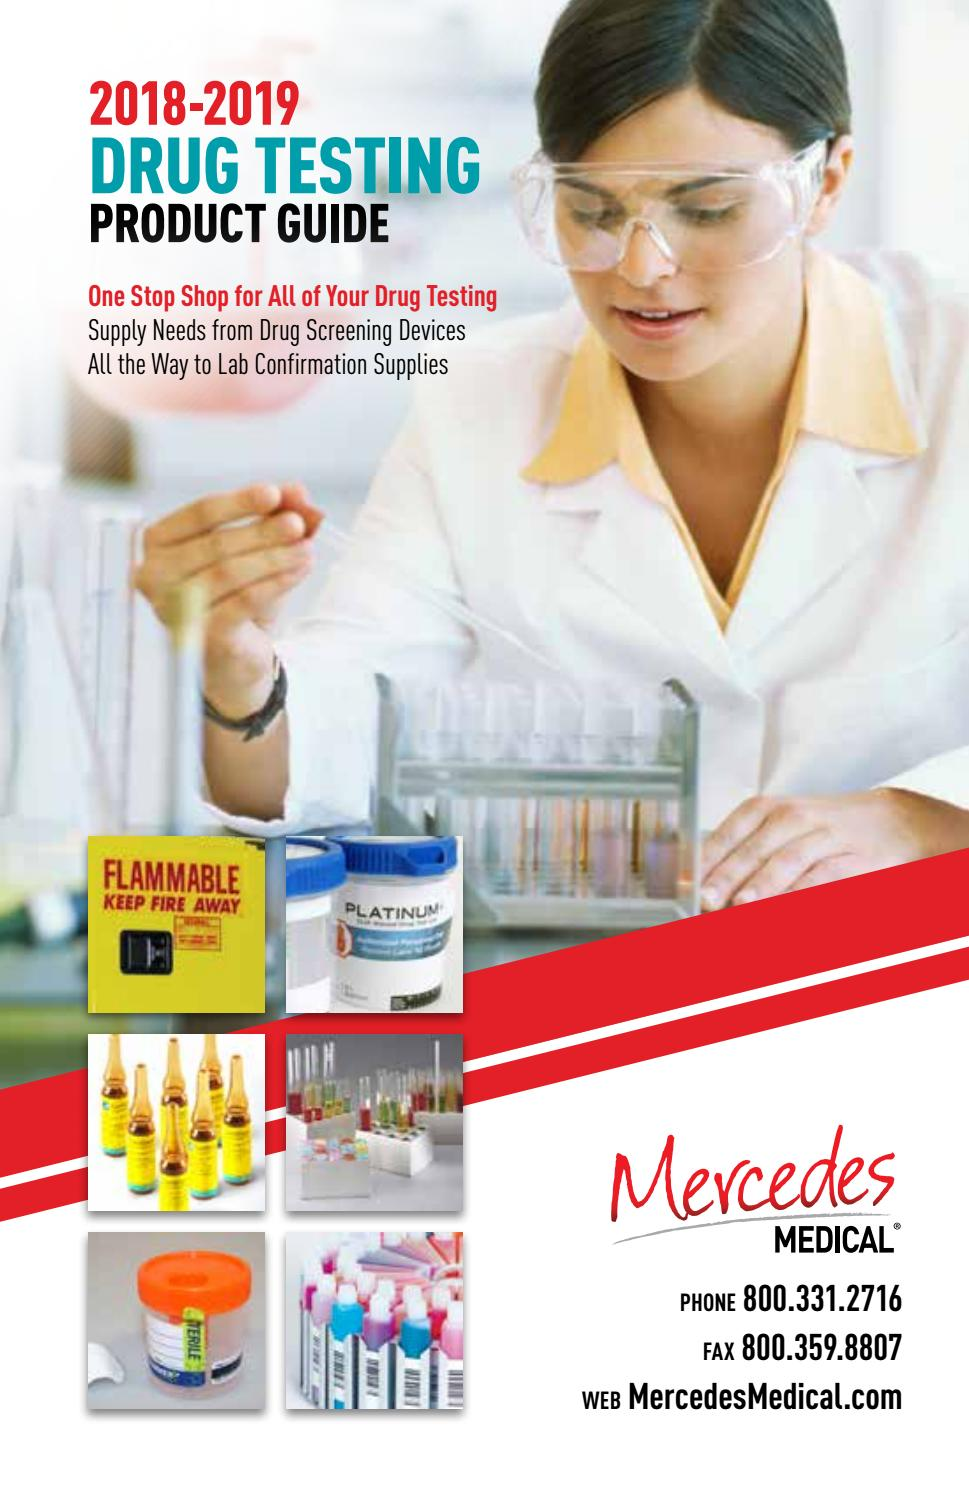 Drug Testing Catalog by Mercedes Scientific - issuu